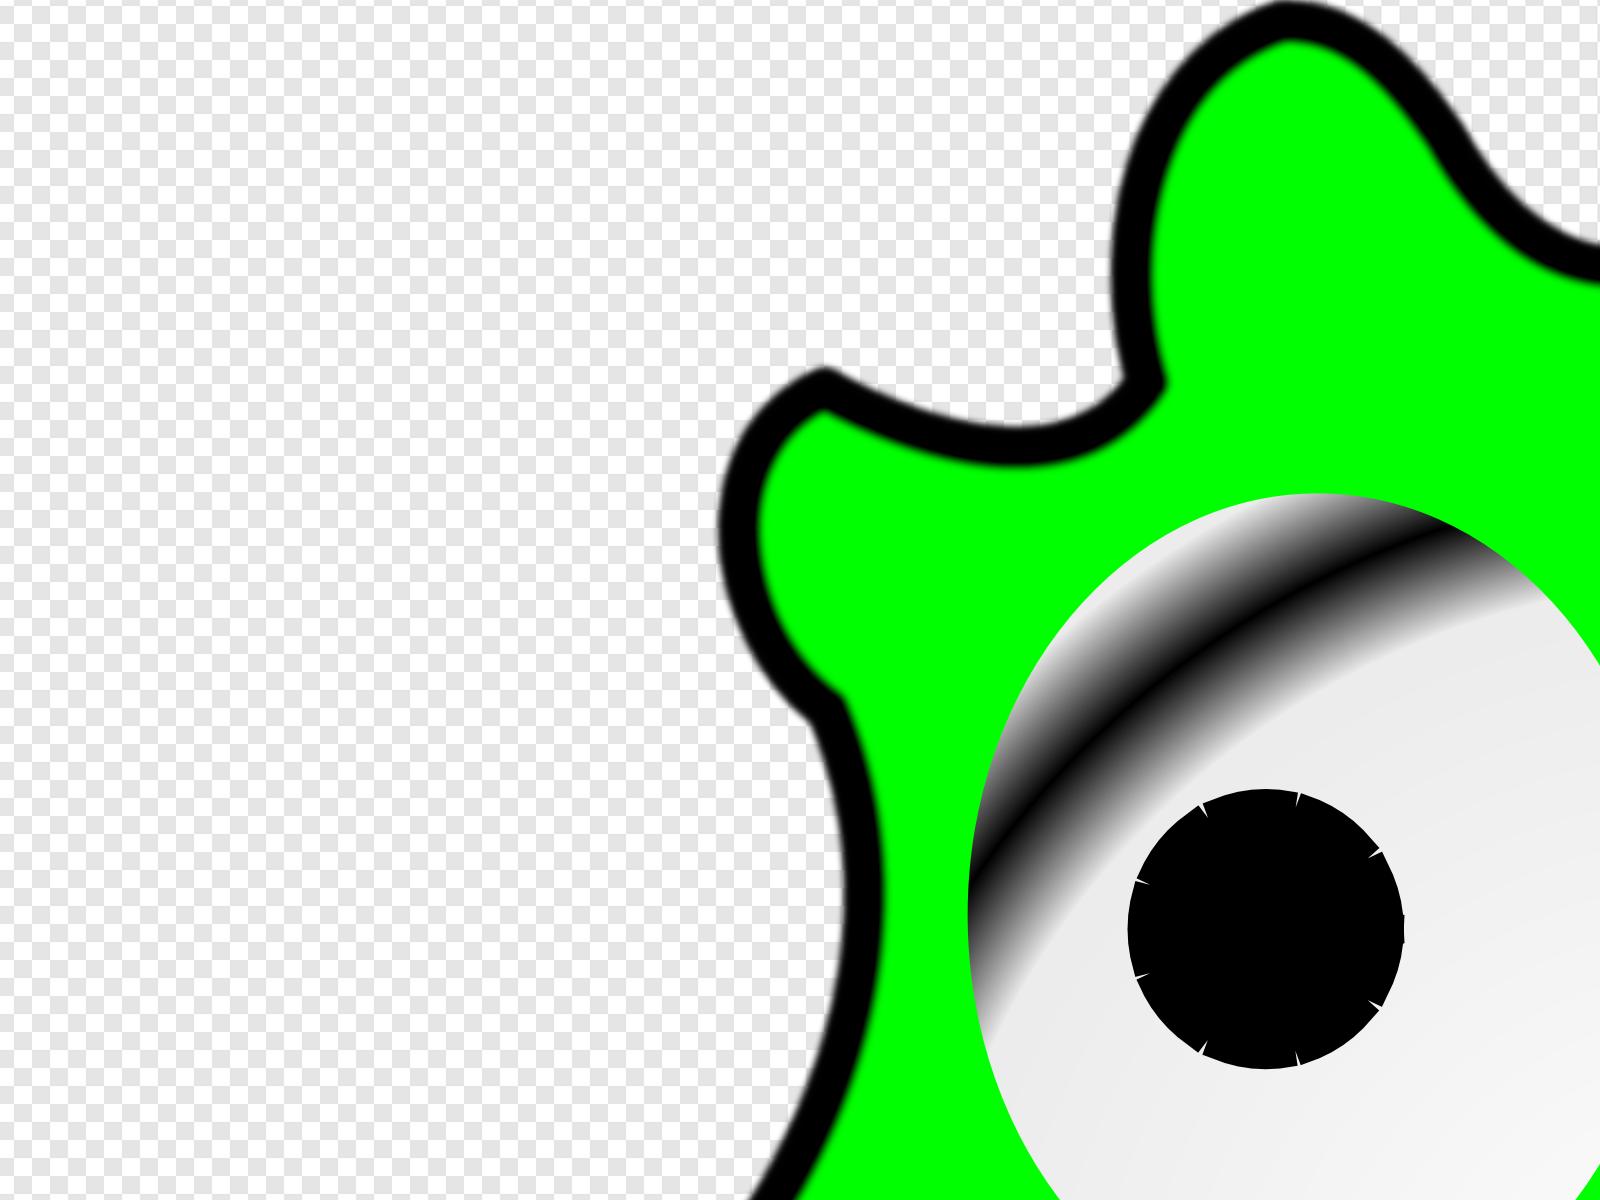 Green clip art icon. Algae clipart happy